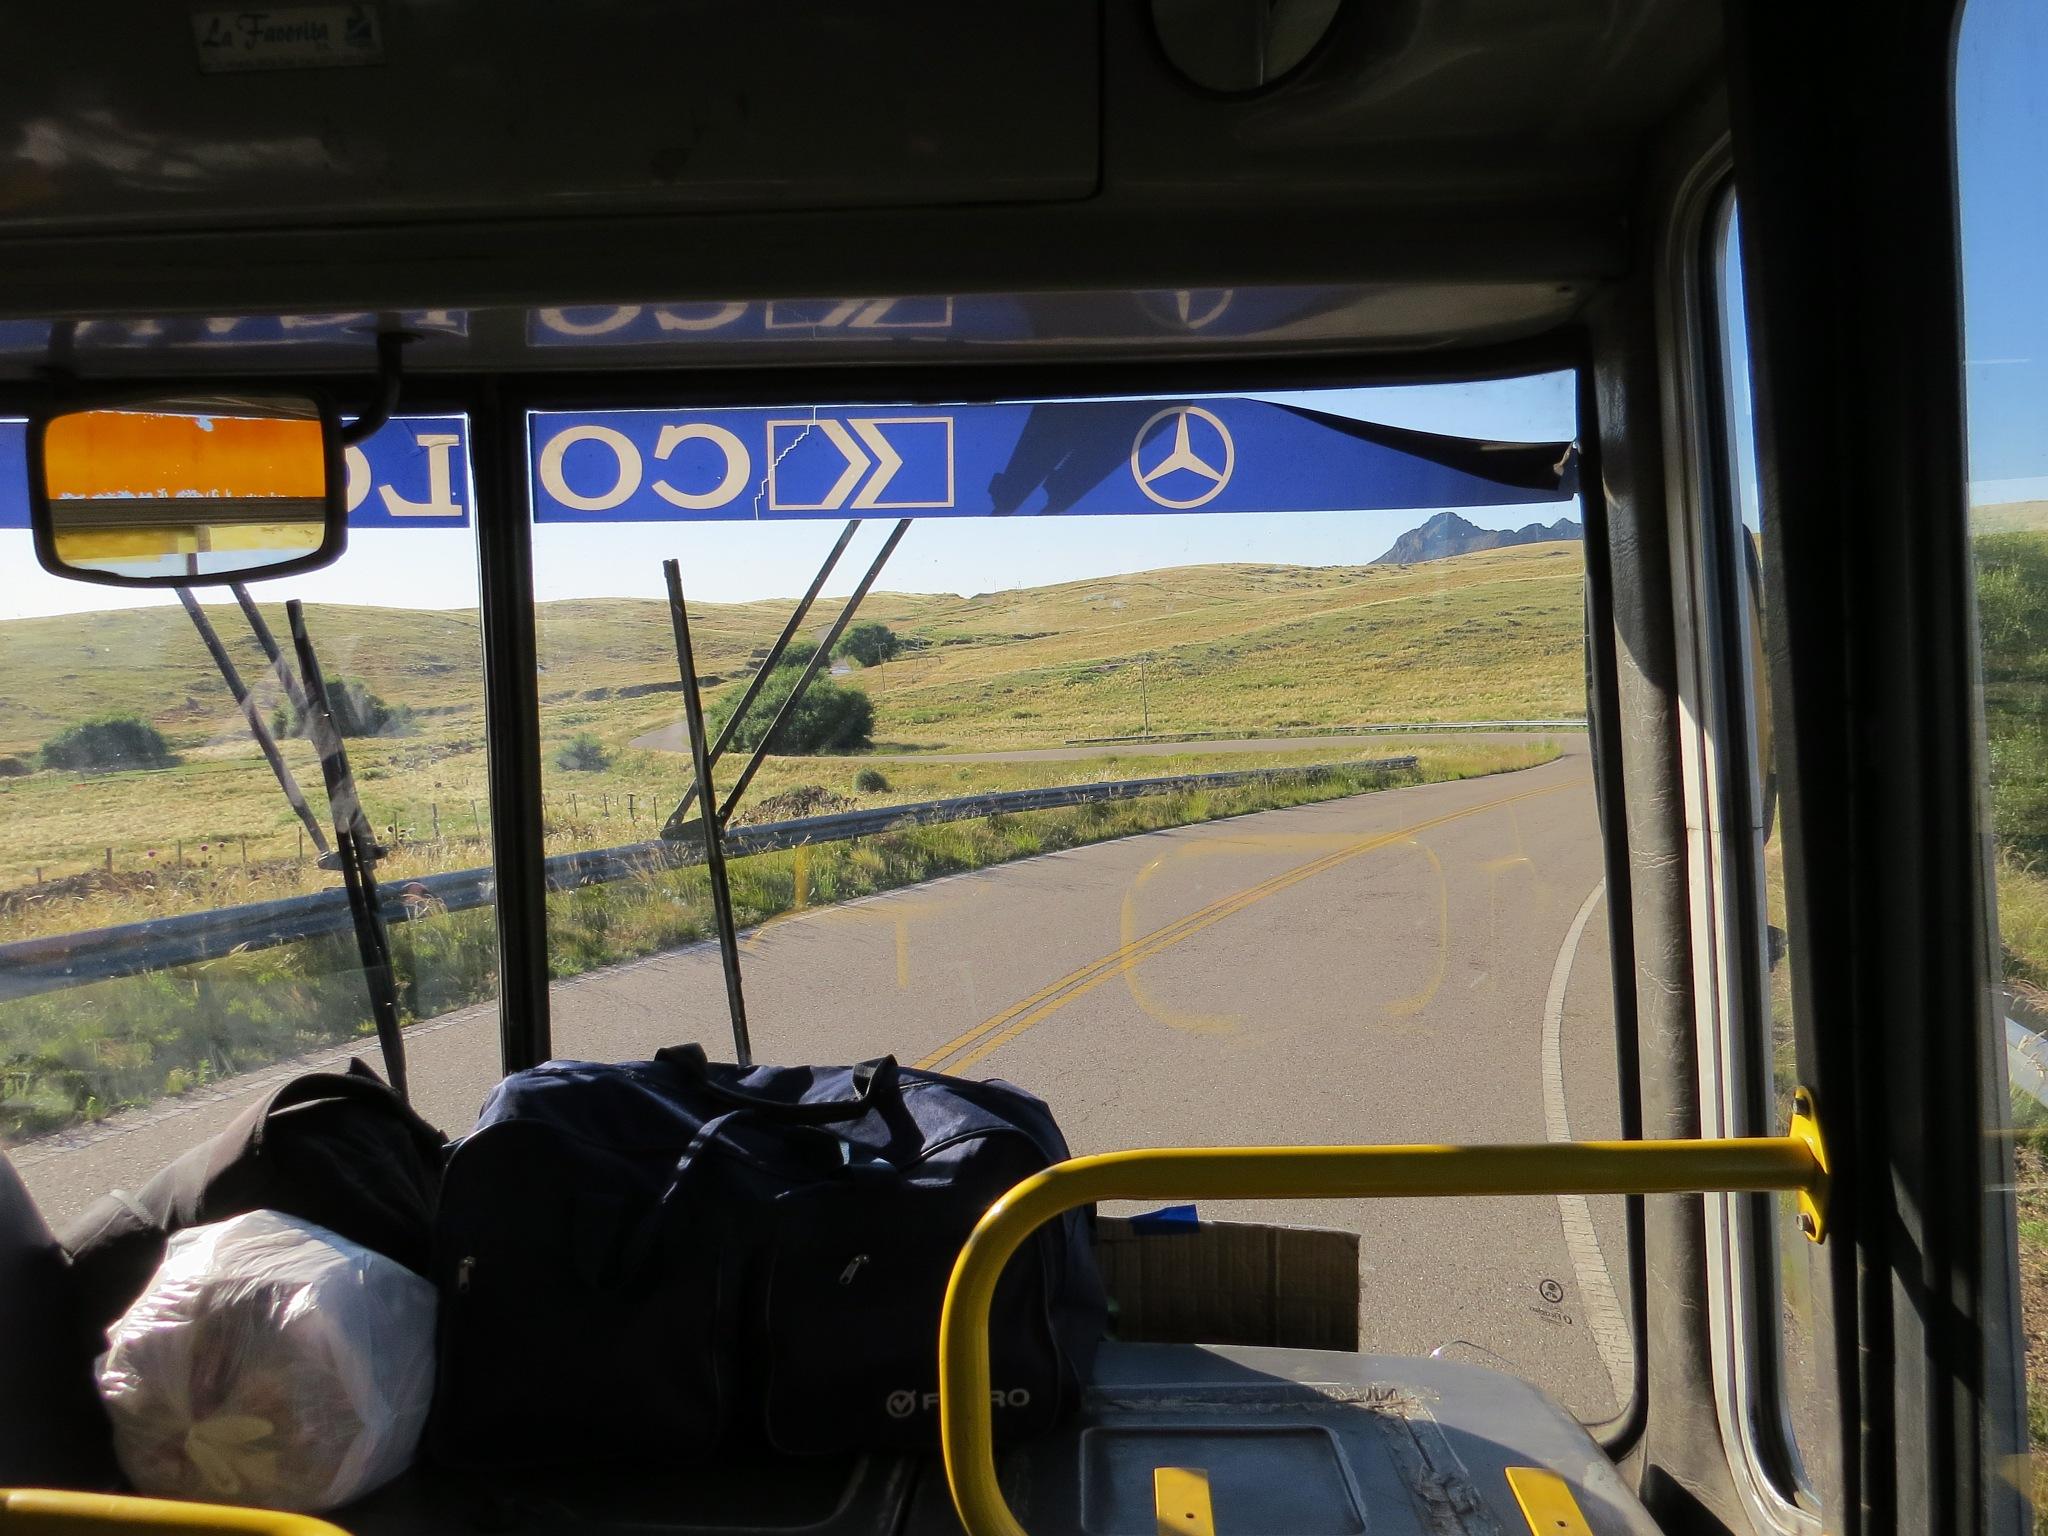 In the bus to La Carolina. by escorter1